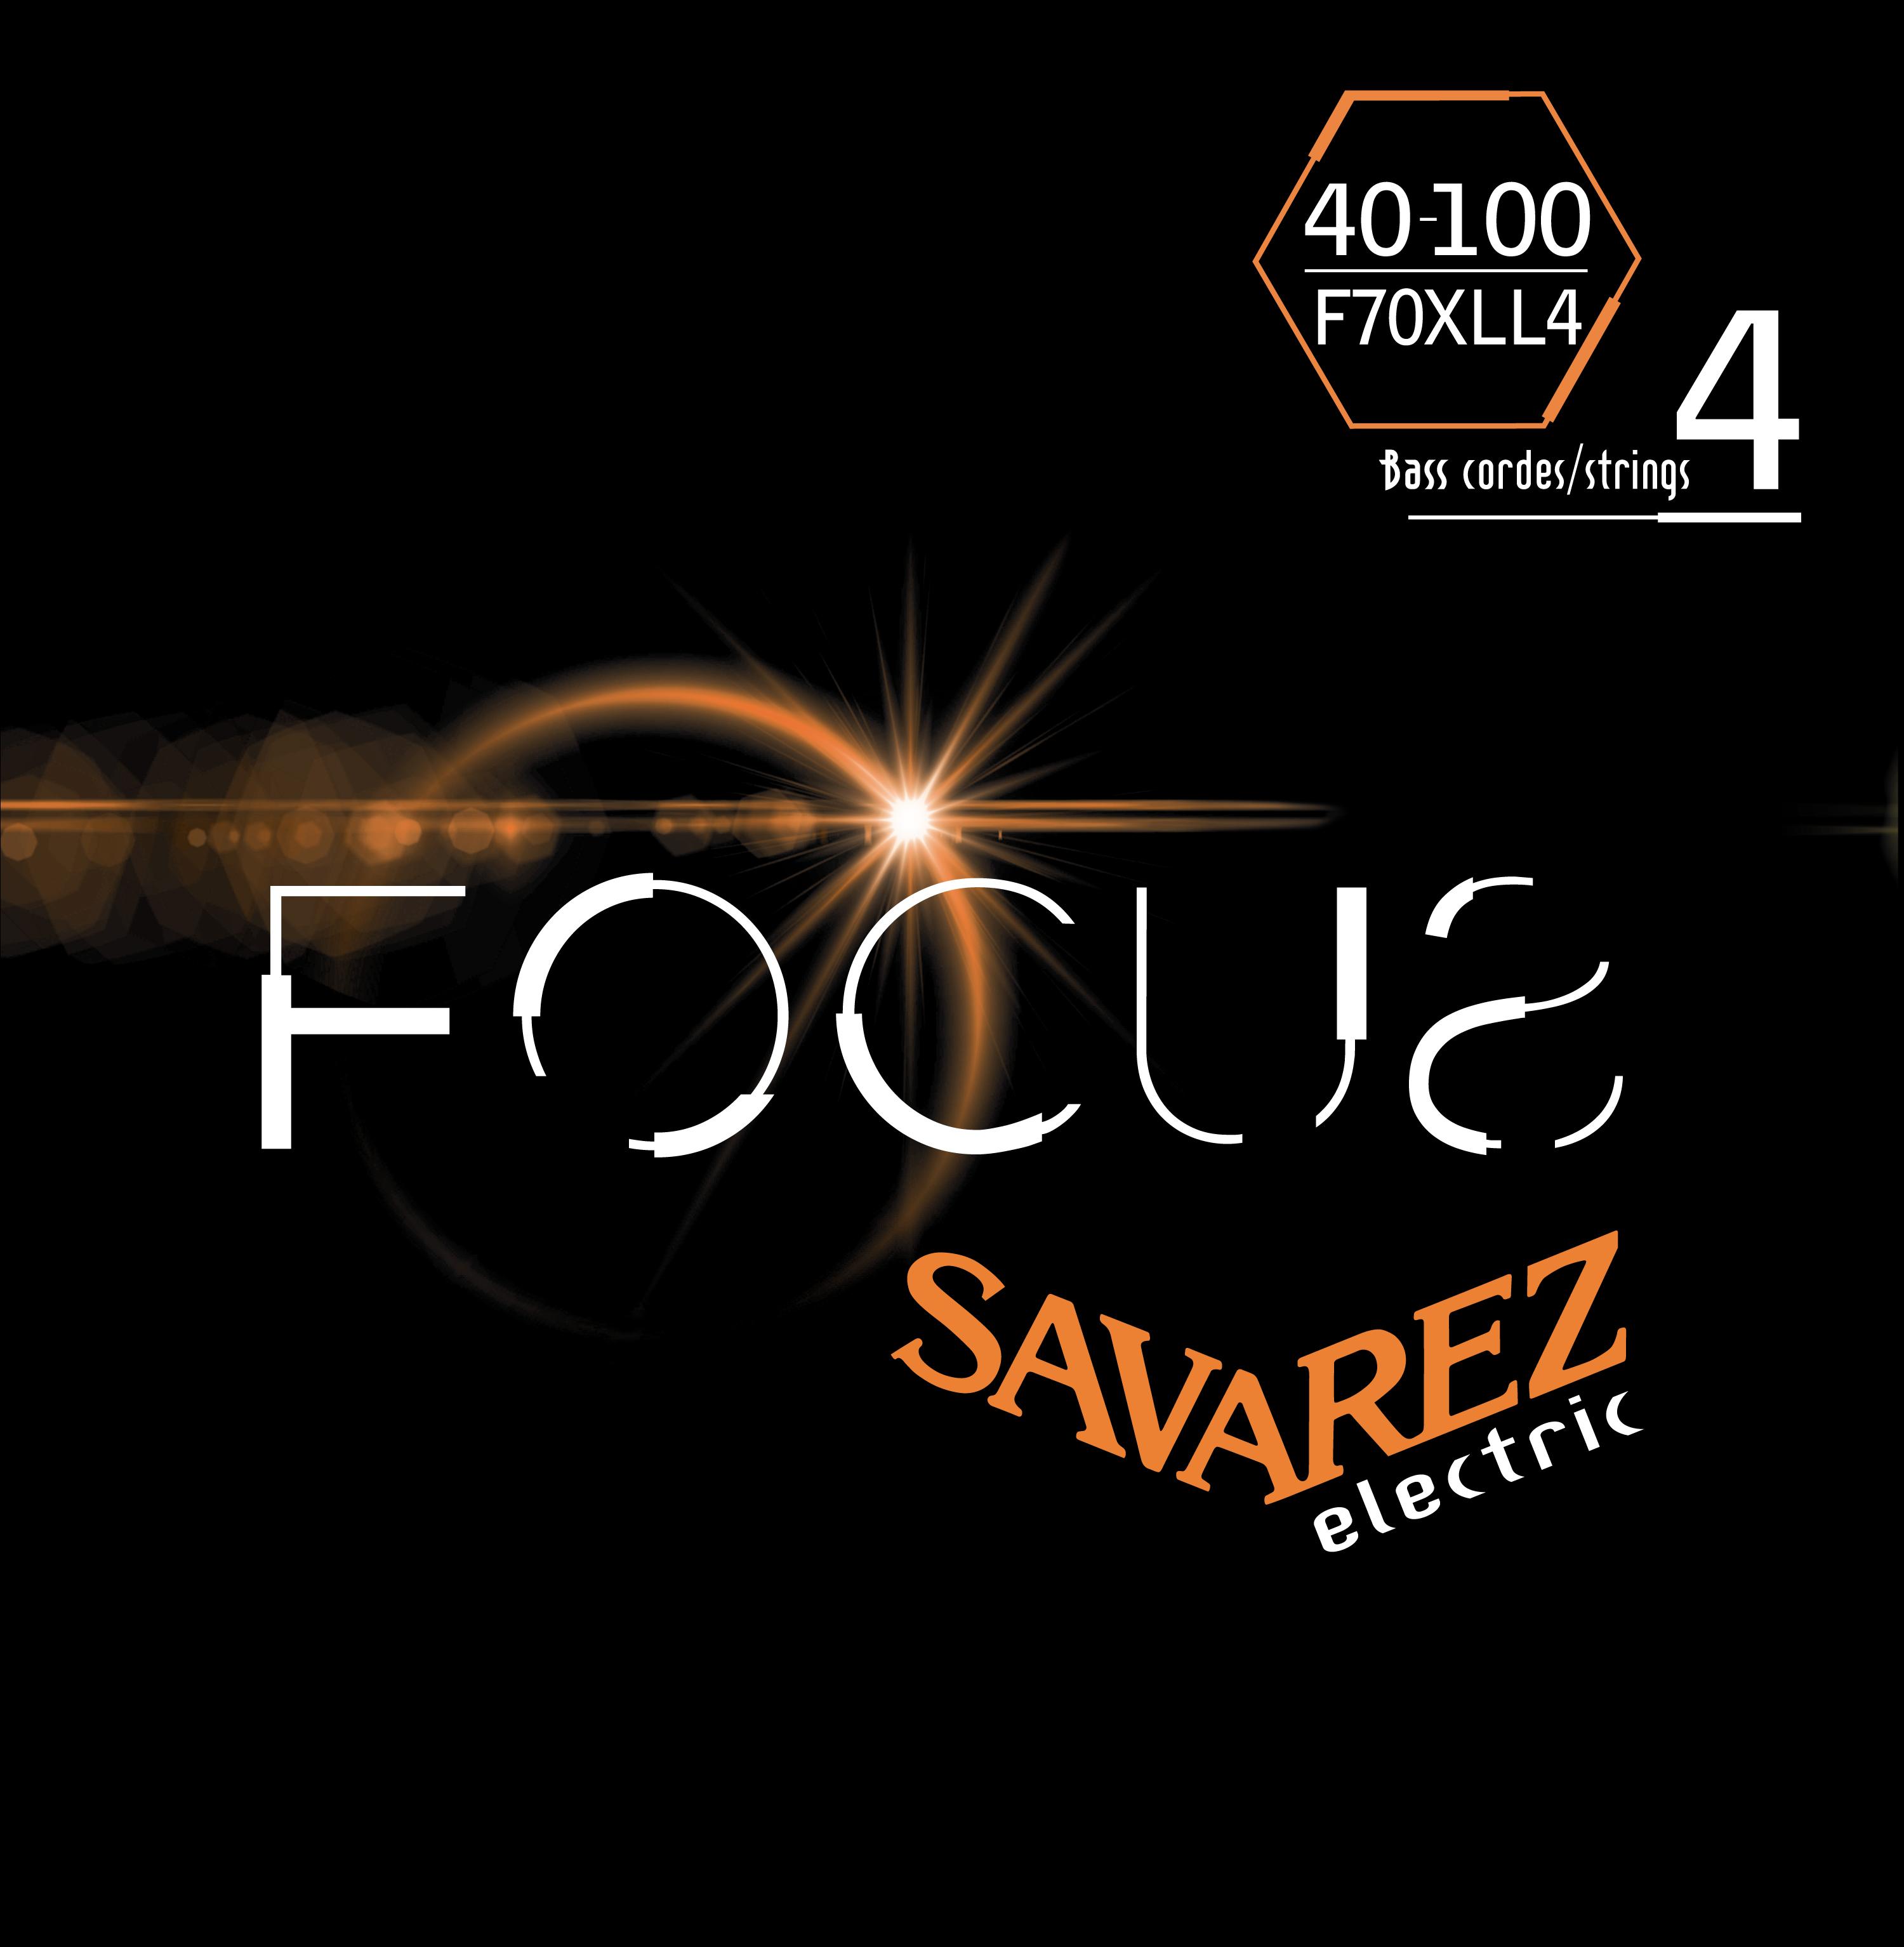 SAVAREZ ELECTRIC FOCUS F70XLL4